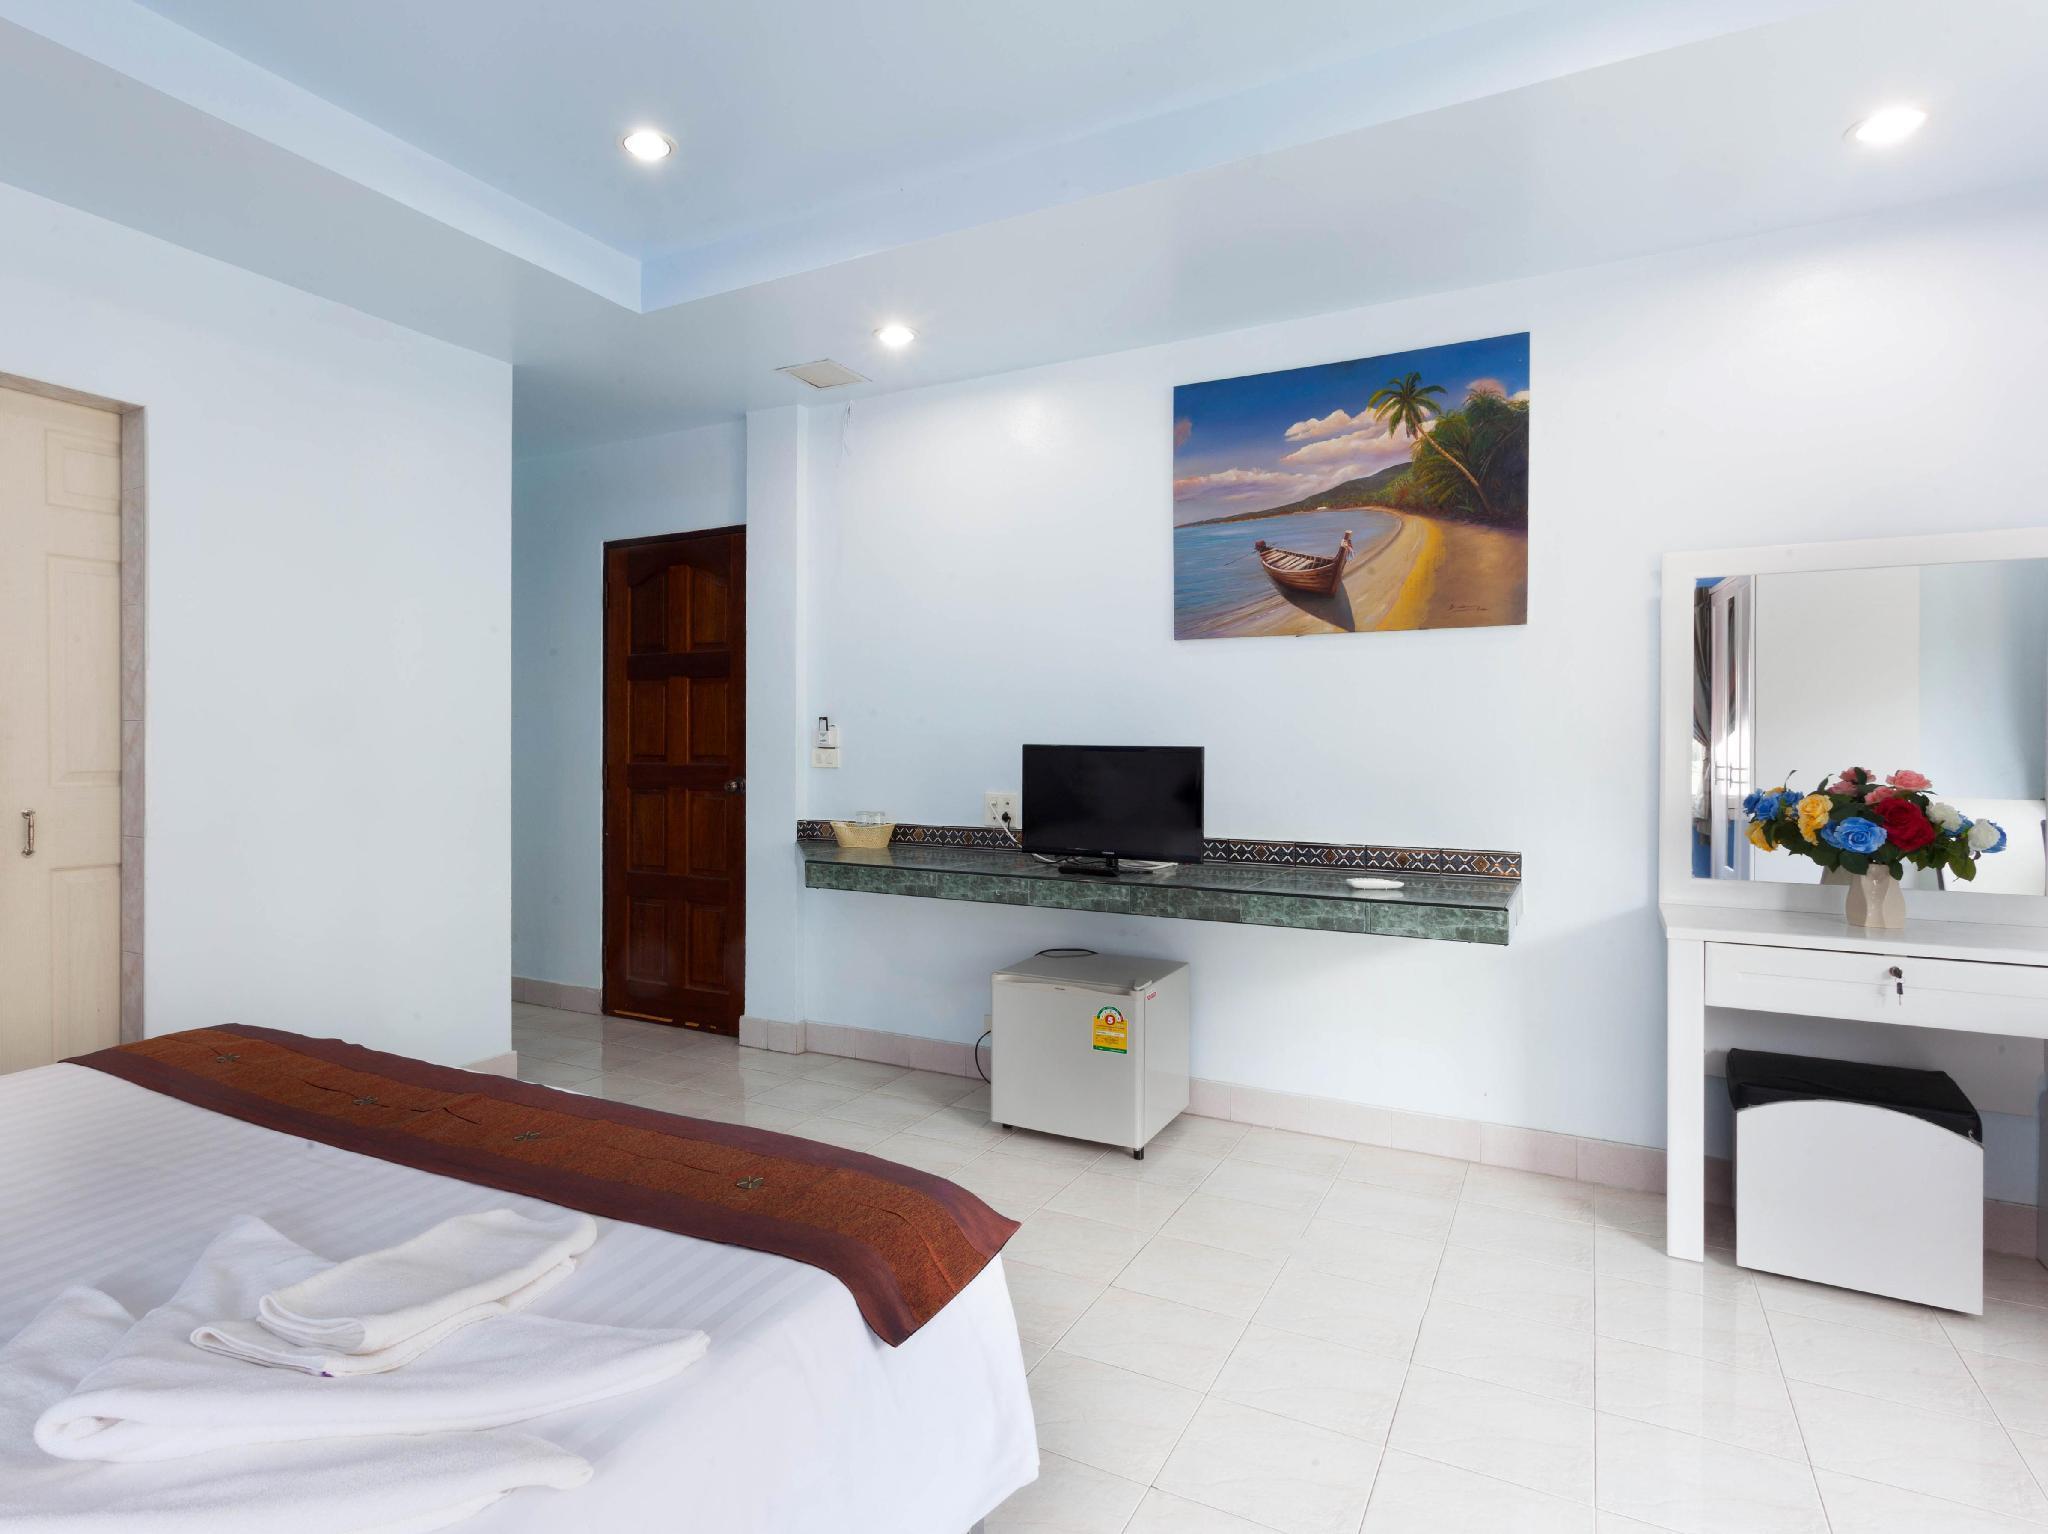 Best Price On Da Mario Hotel And Restaurant In Phuket Reviews # Meuble Tv Sonorise